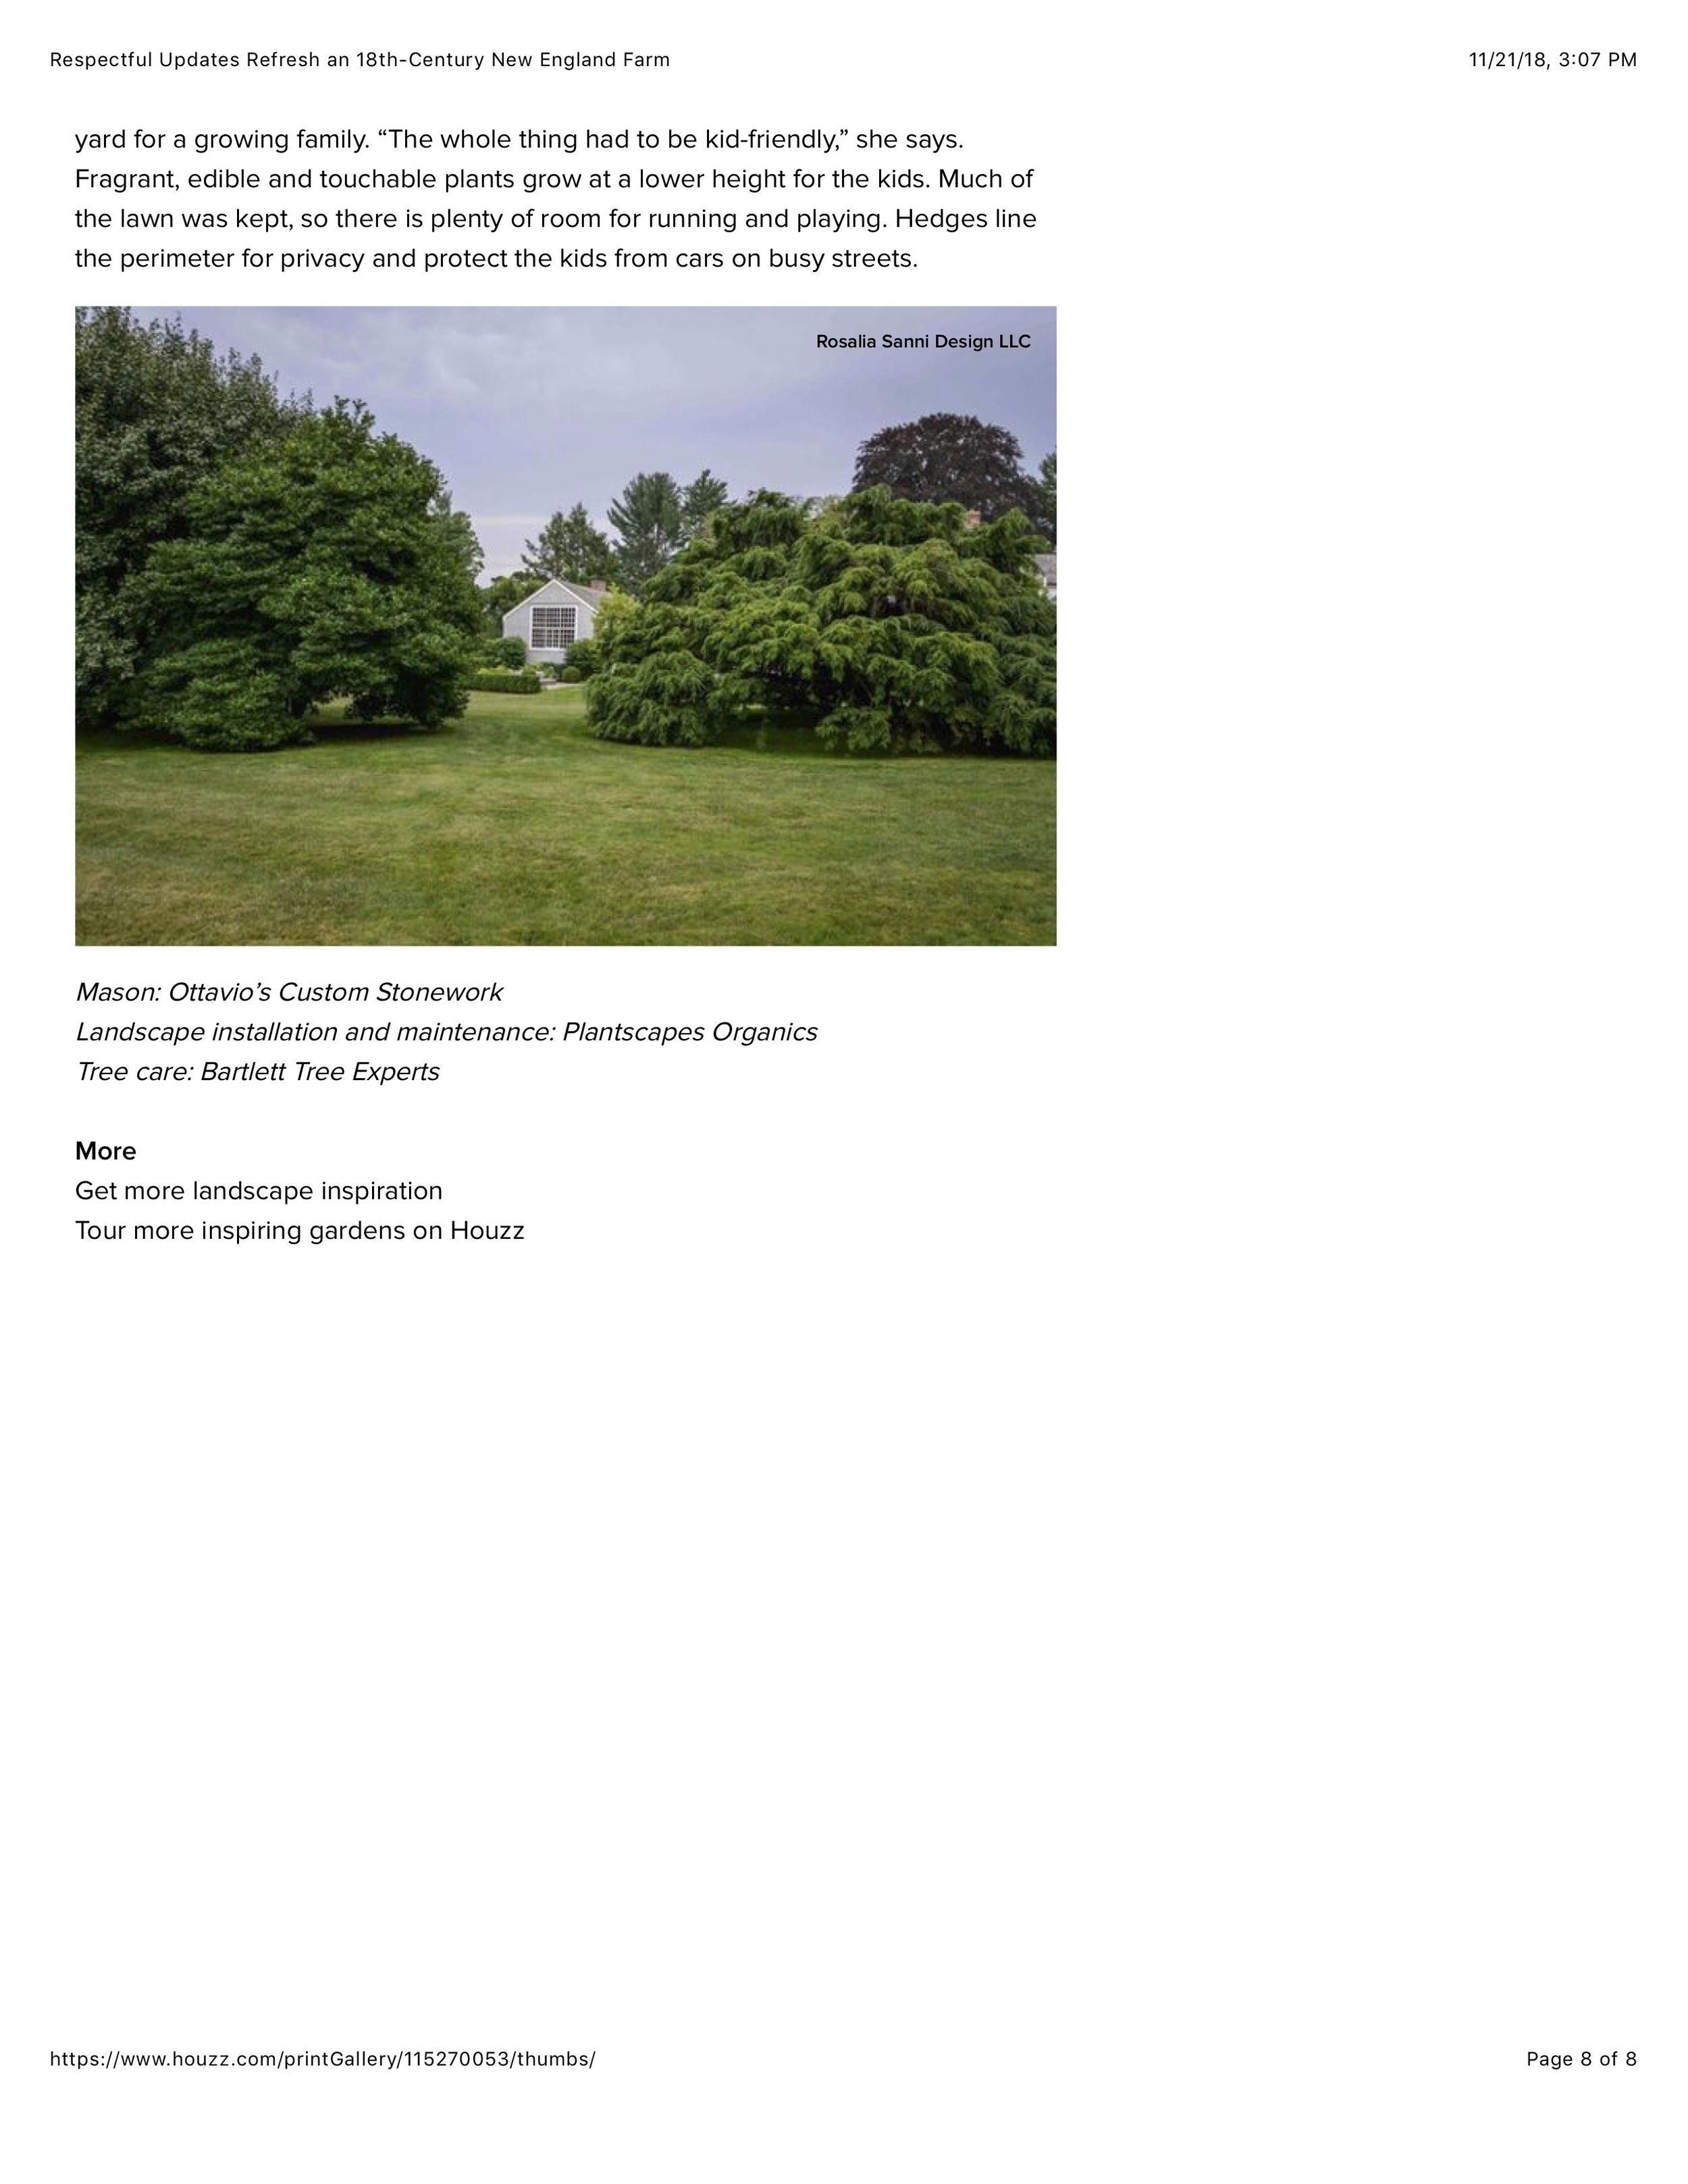 Respectful Updates Refresh an 18th-Century New England Farm 8.jpg